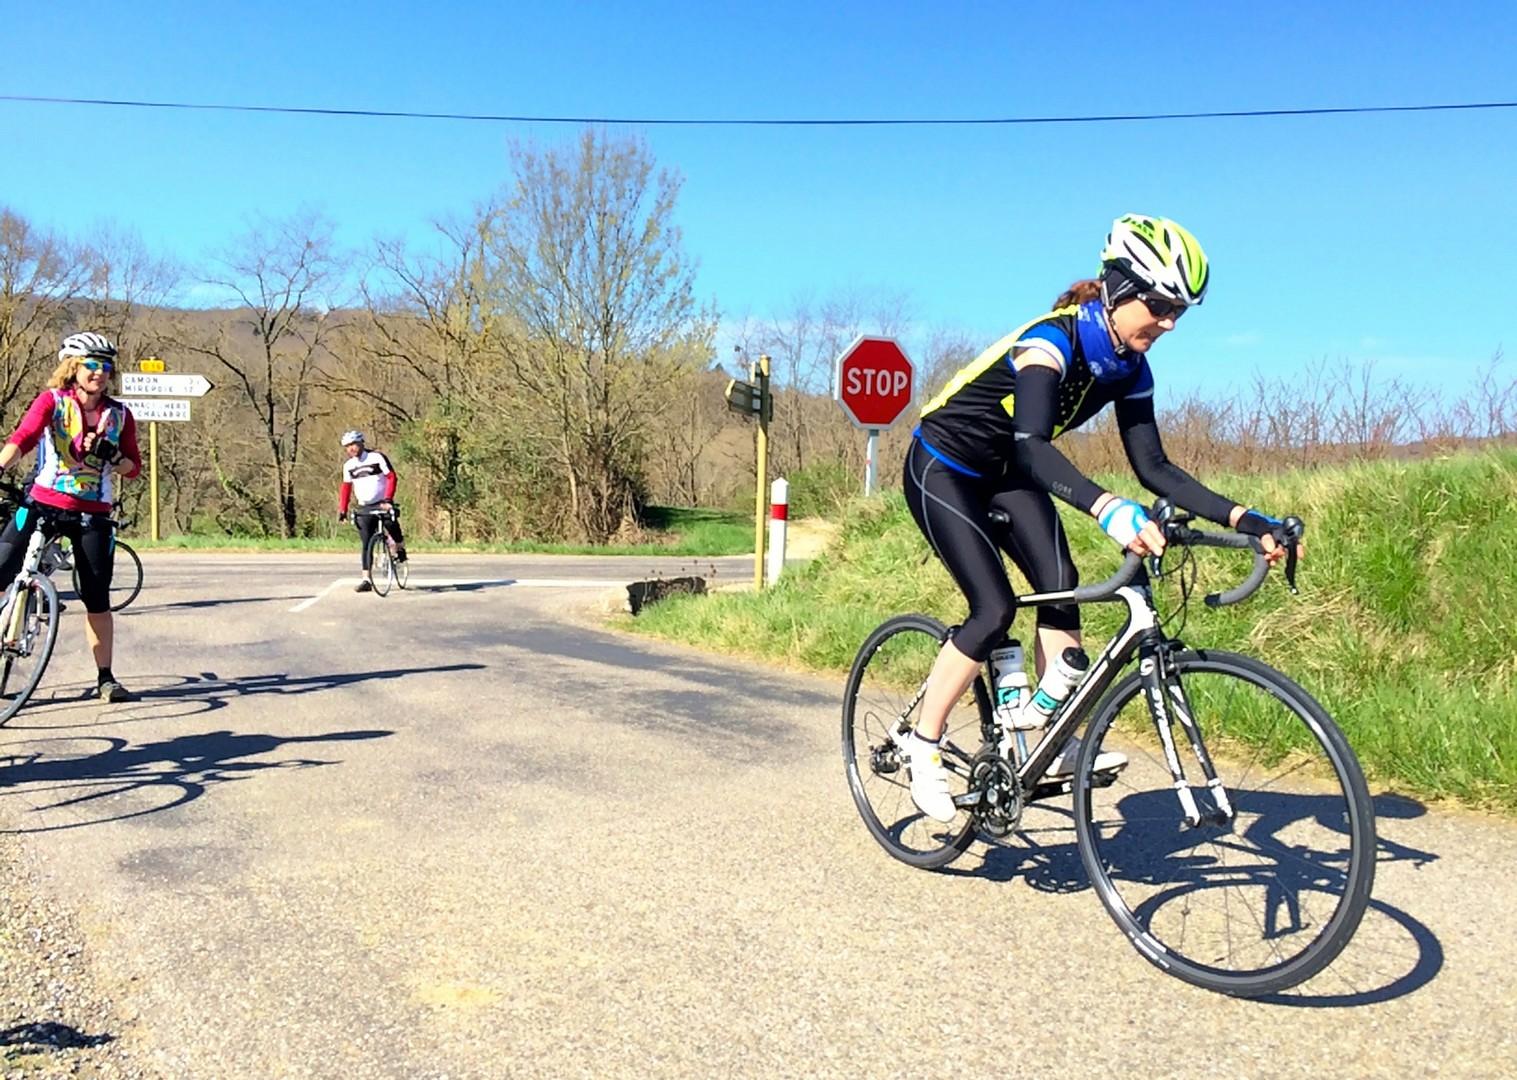 group-guided-road-cycling-holiday-france.jpg - France - Pyrenees Fitness Week - Guided Road Cycling Holiday (Grade 3-4) - Road Cycling